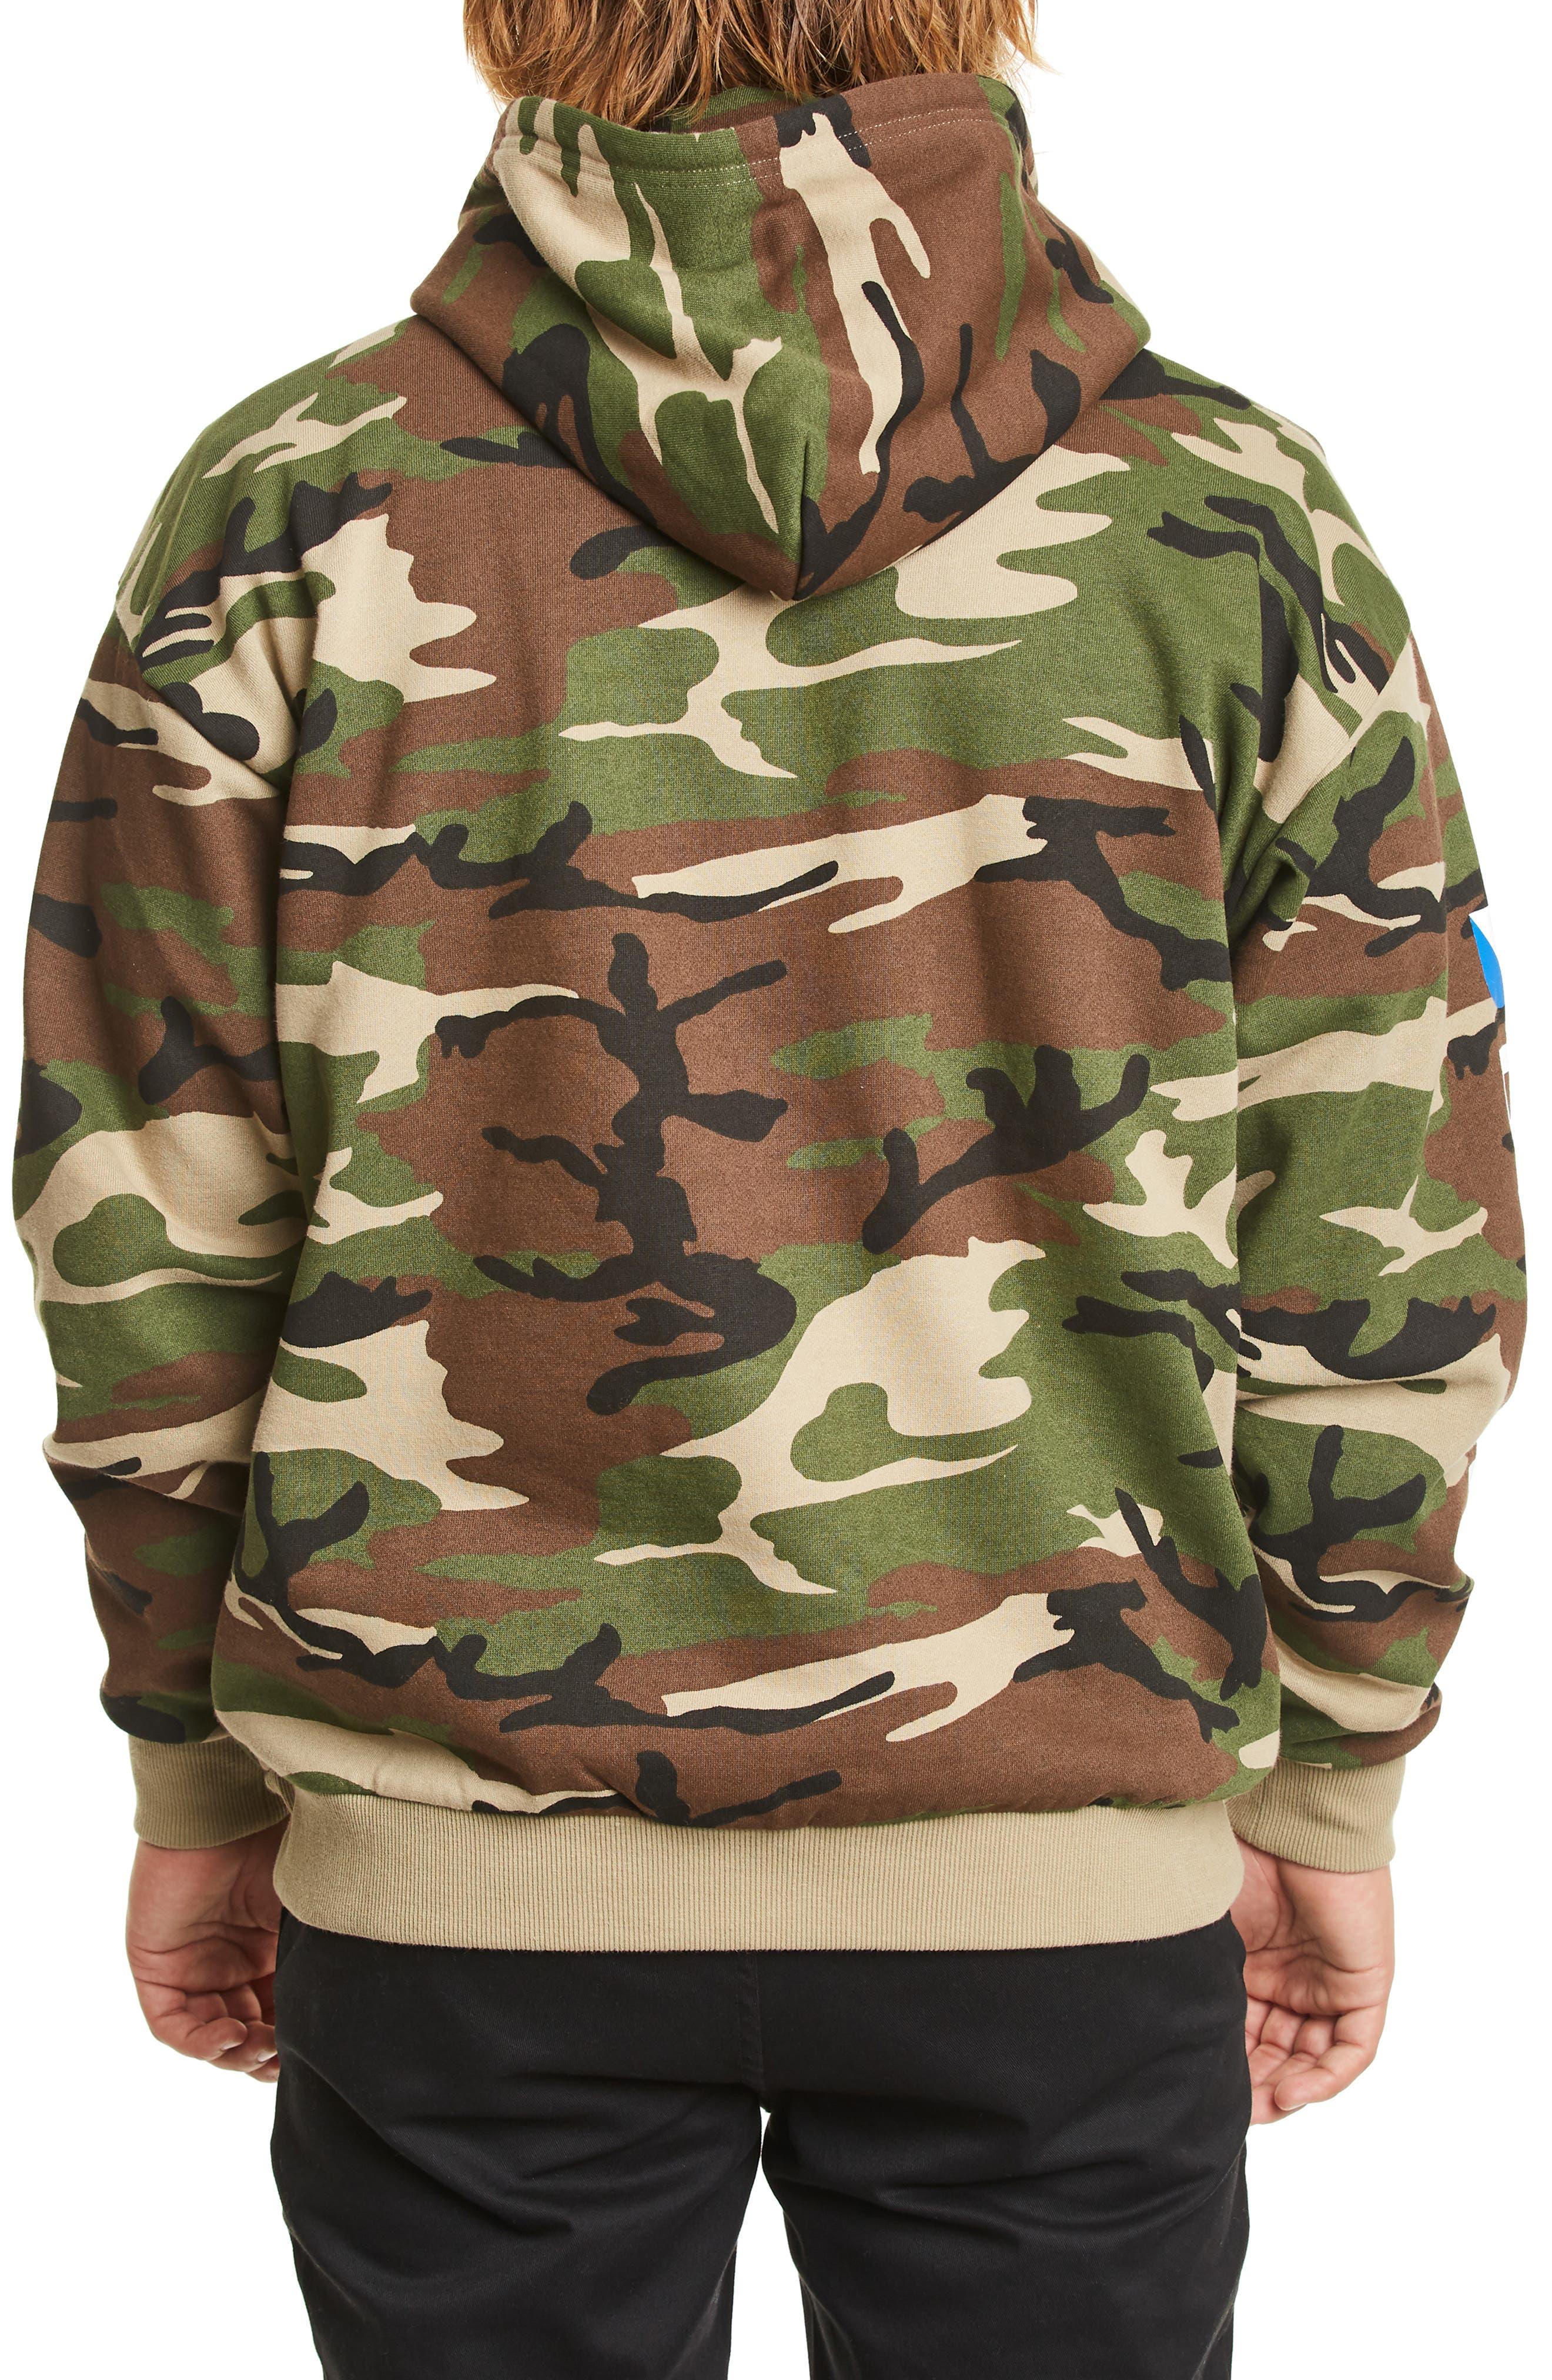 Stowell Hoodie Sweatshirt,                             Alternate thumbnail 2, color,                             CAMO